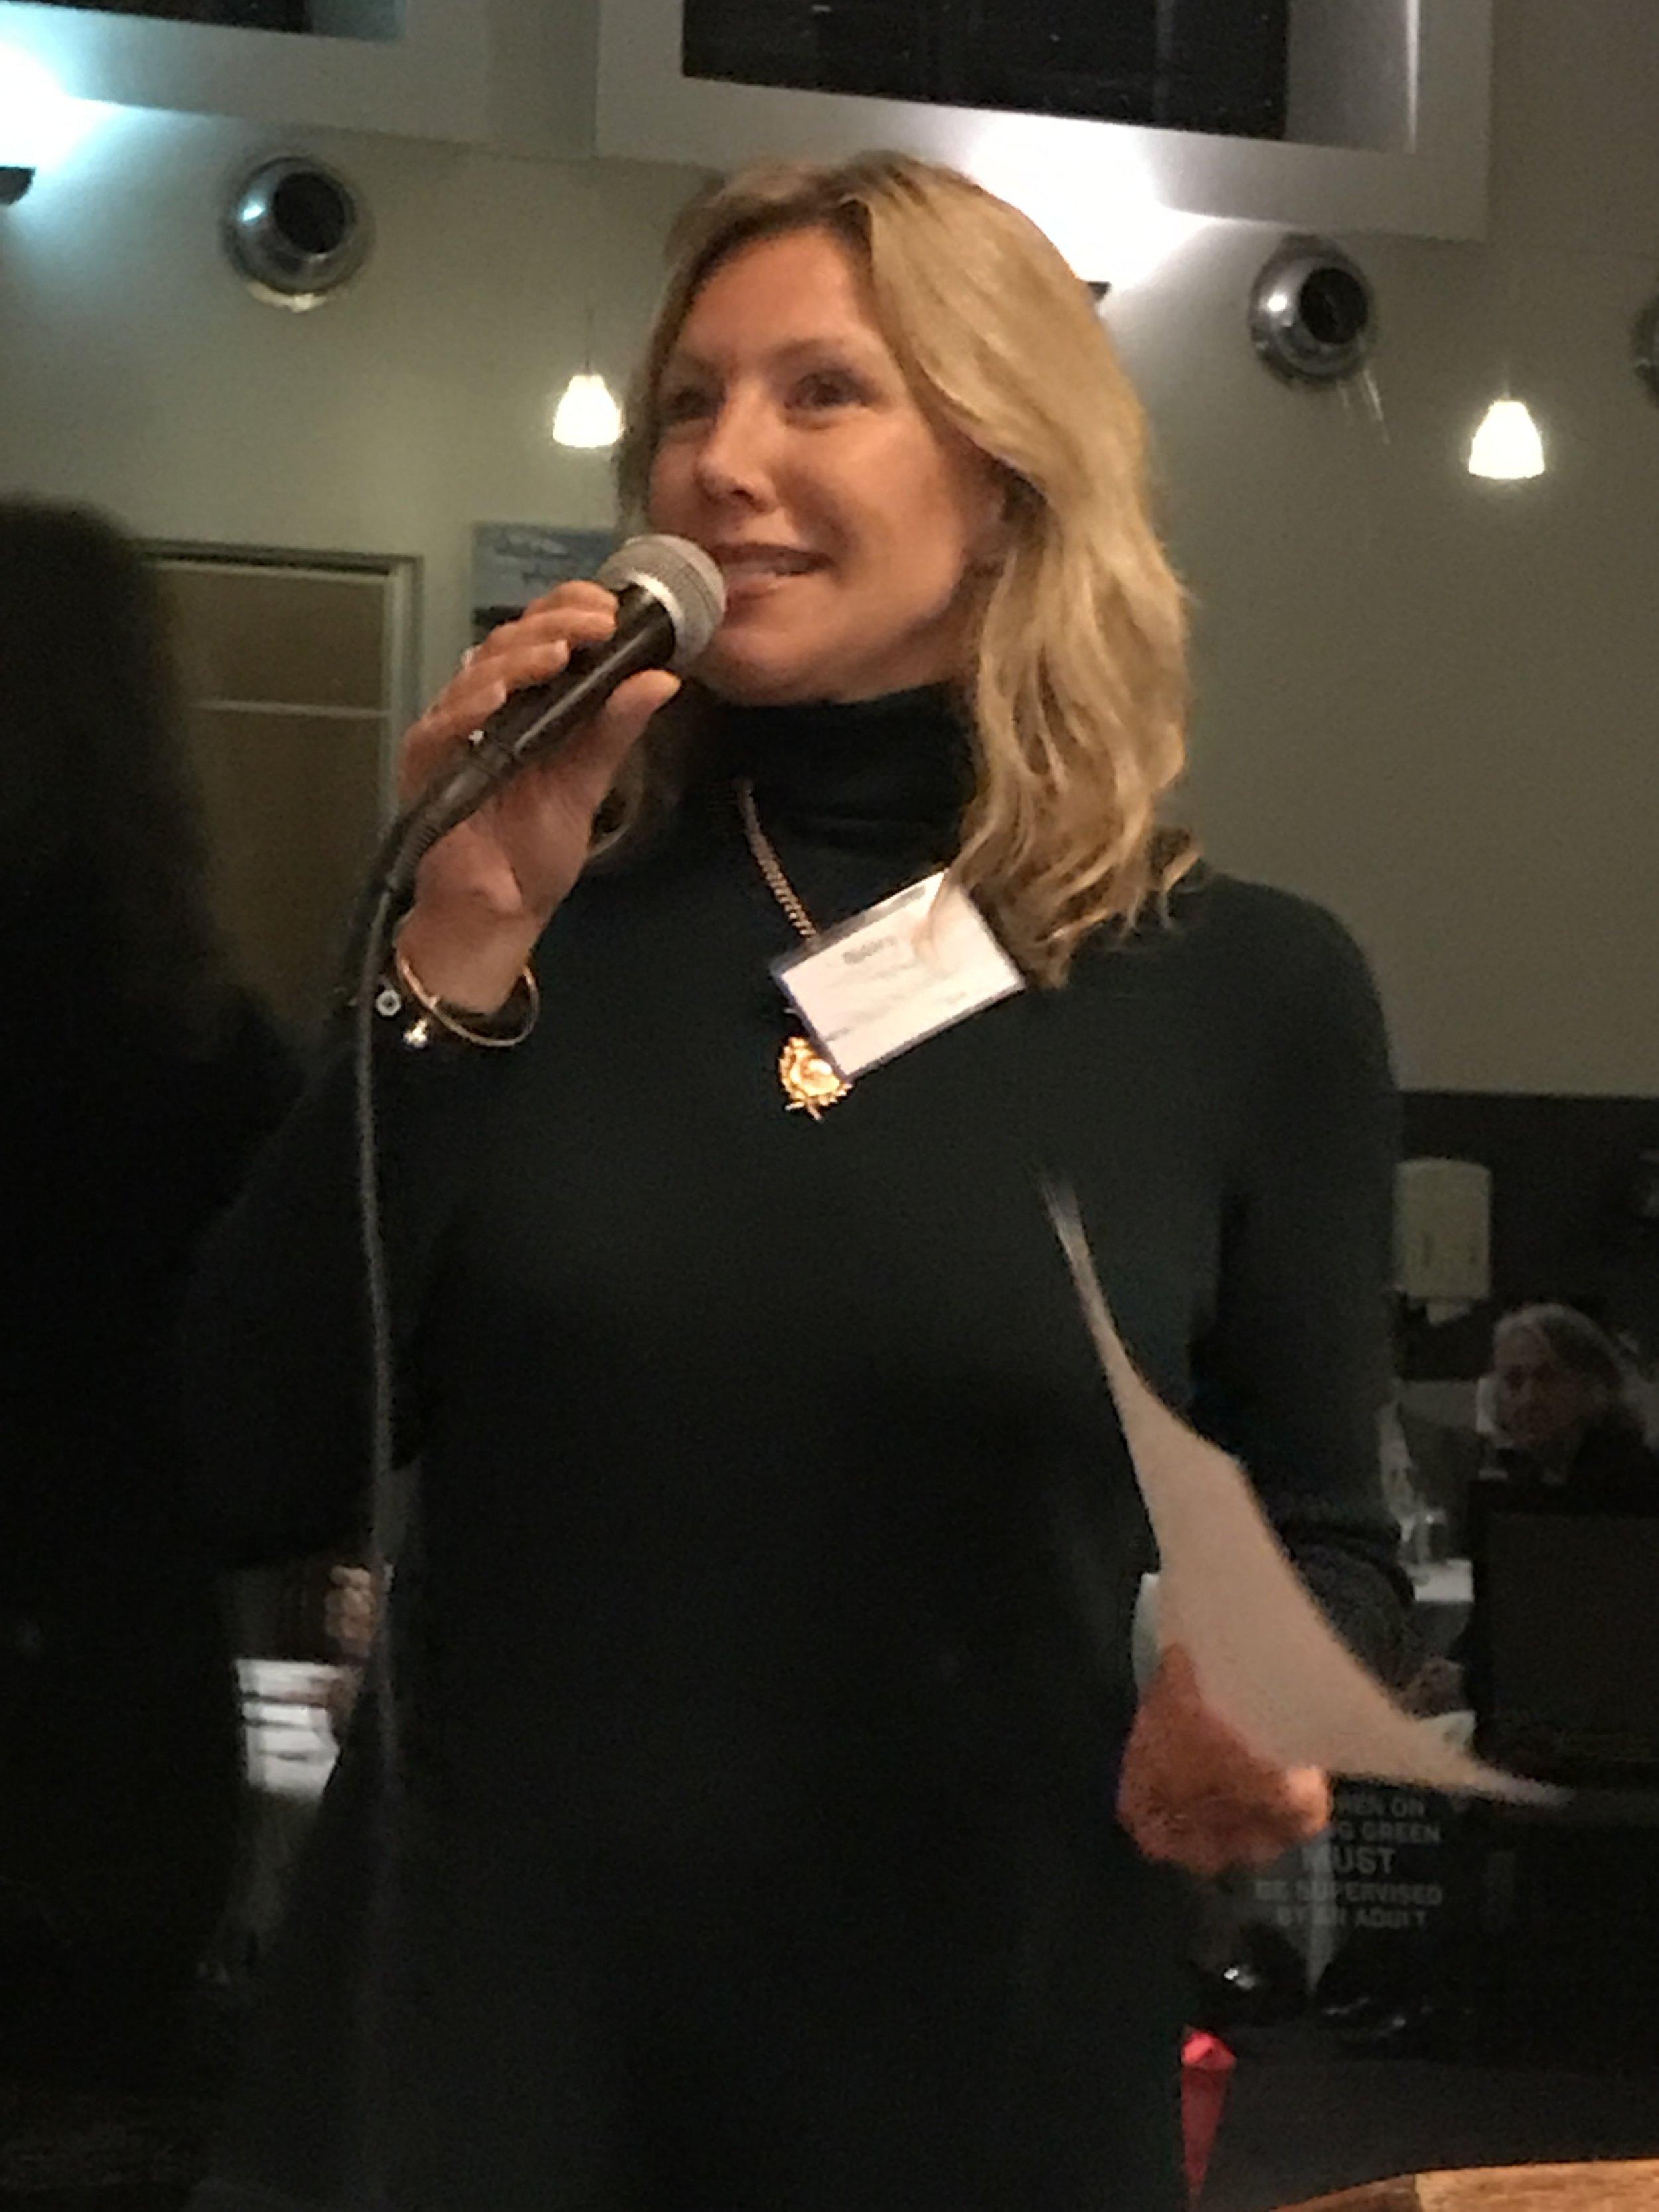 Paula Nicholson, chair of Ballarat Arts Foundation